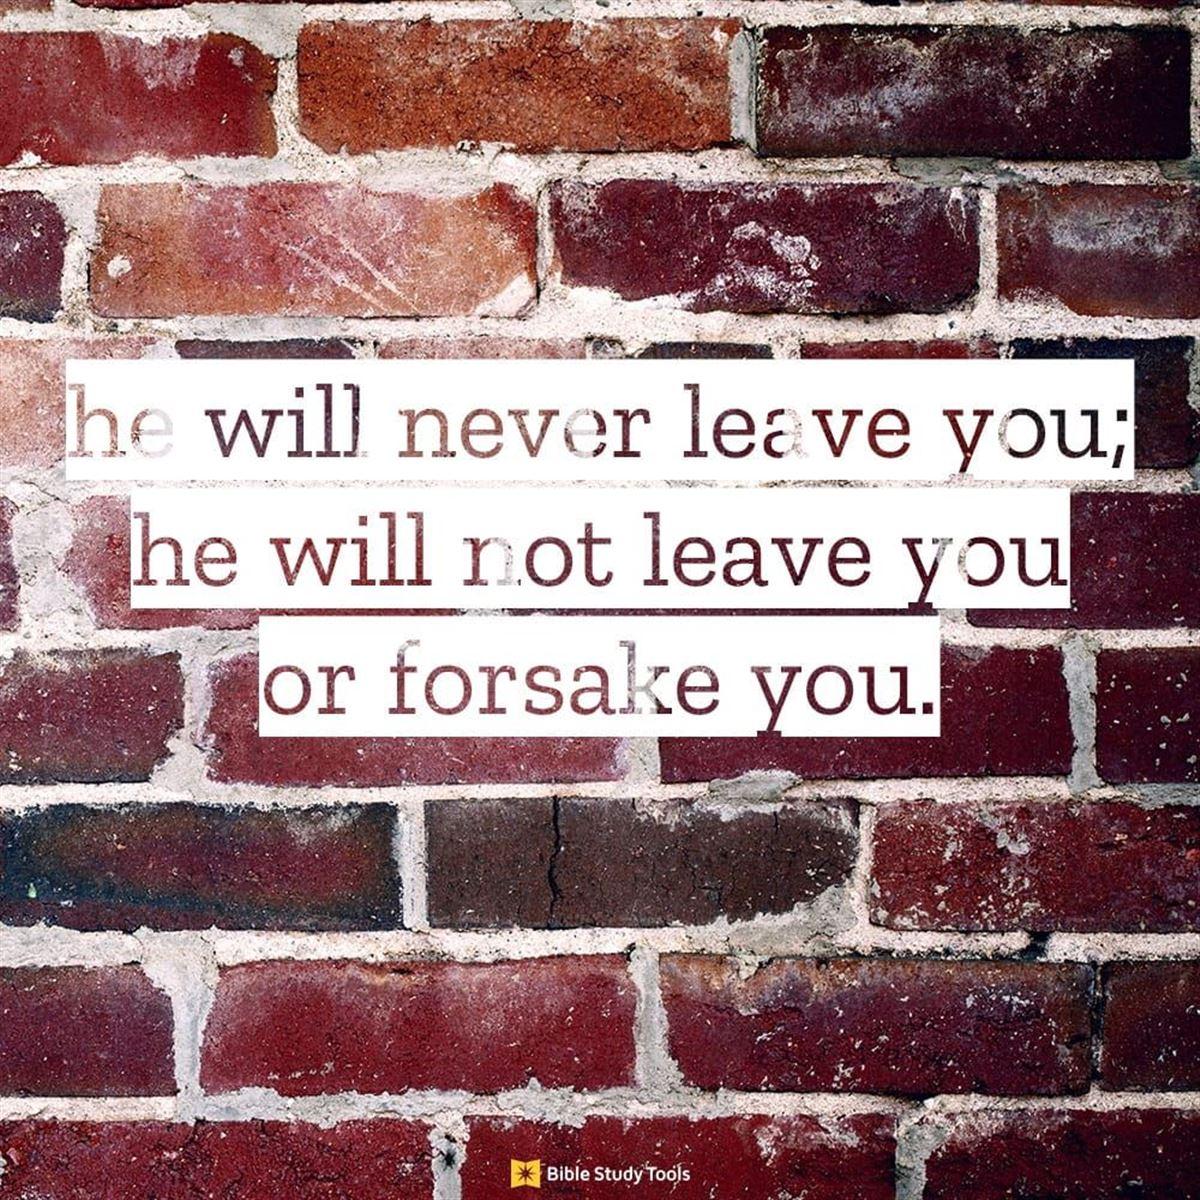 Your Daily Prayer - Deuteronomy 31:8